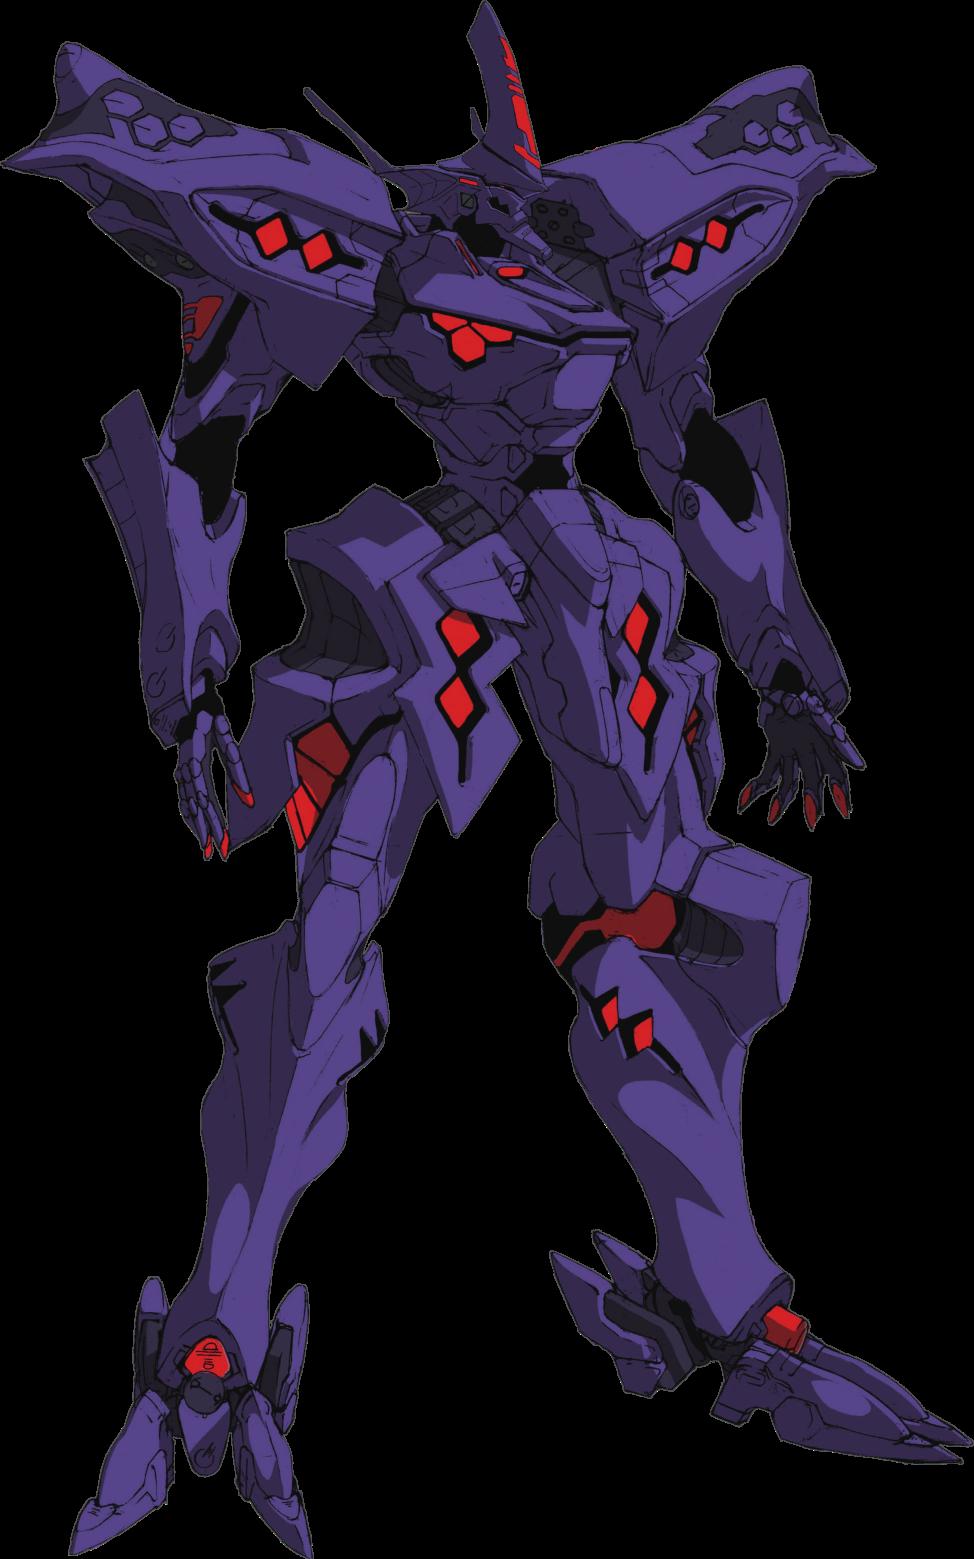 Type-00 Takemikazuchi